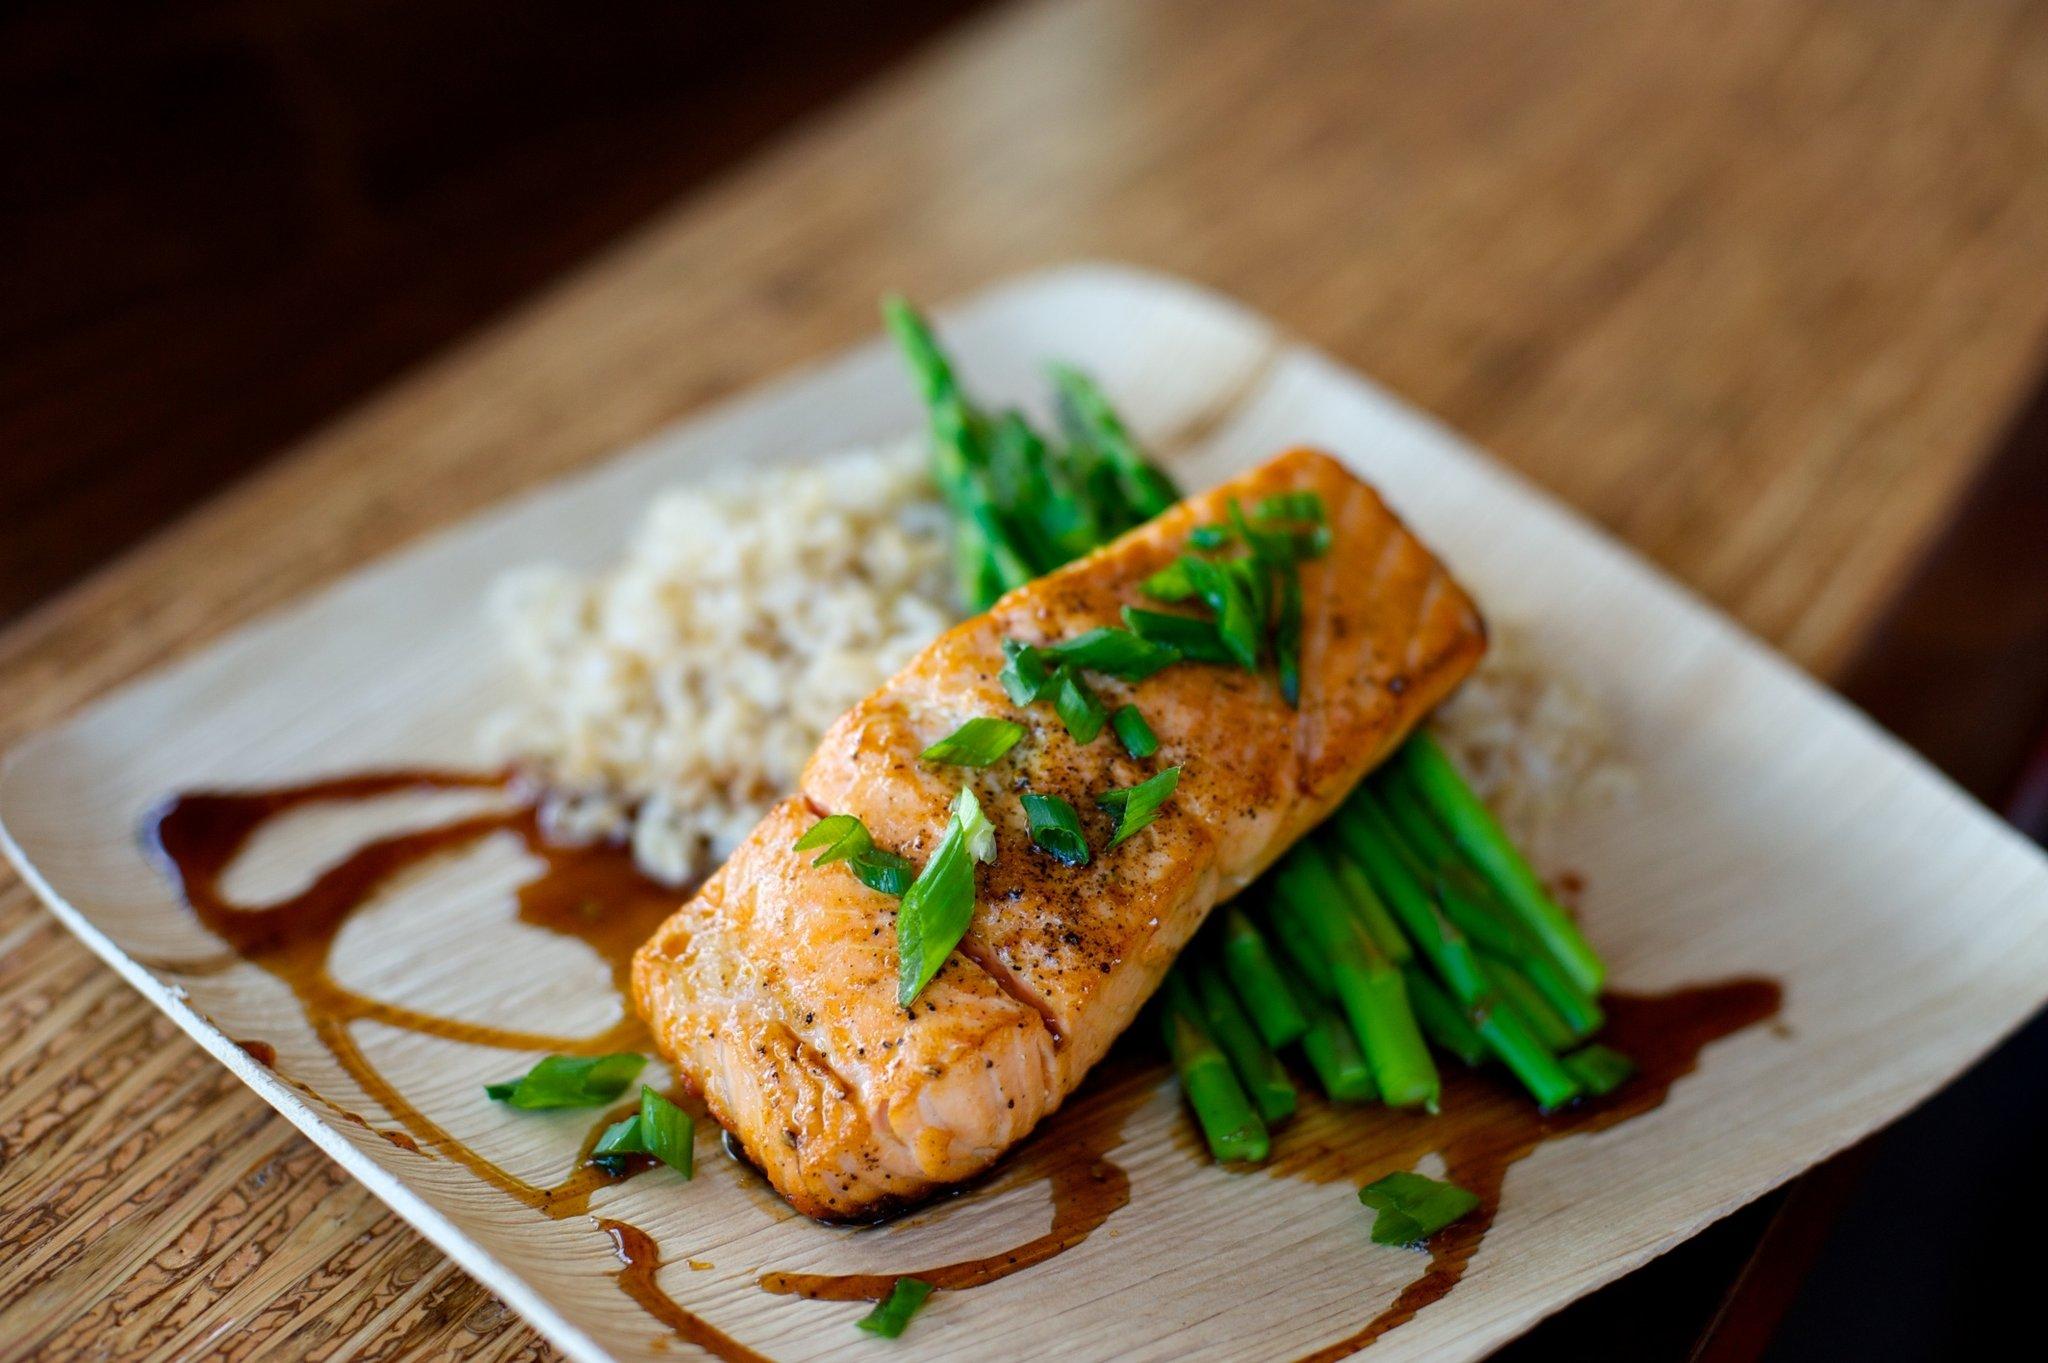 Salmon plate